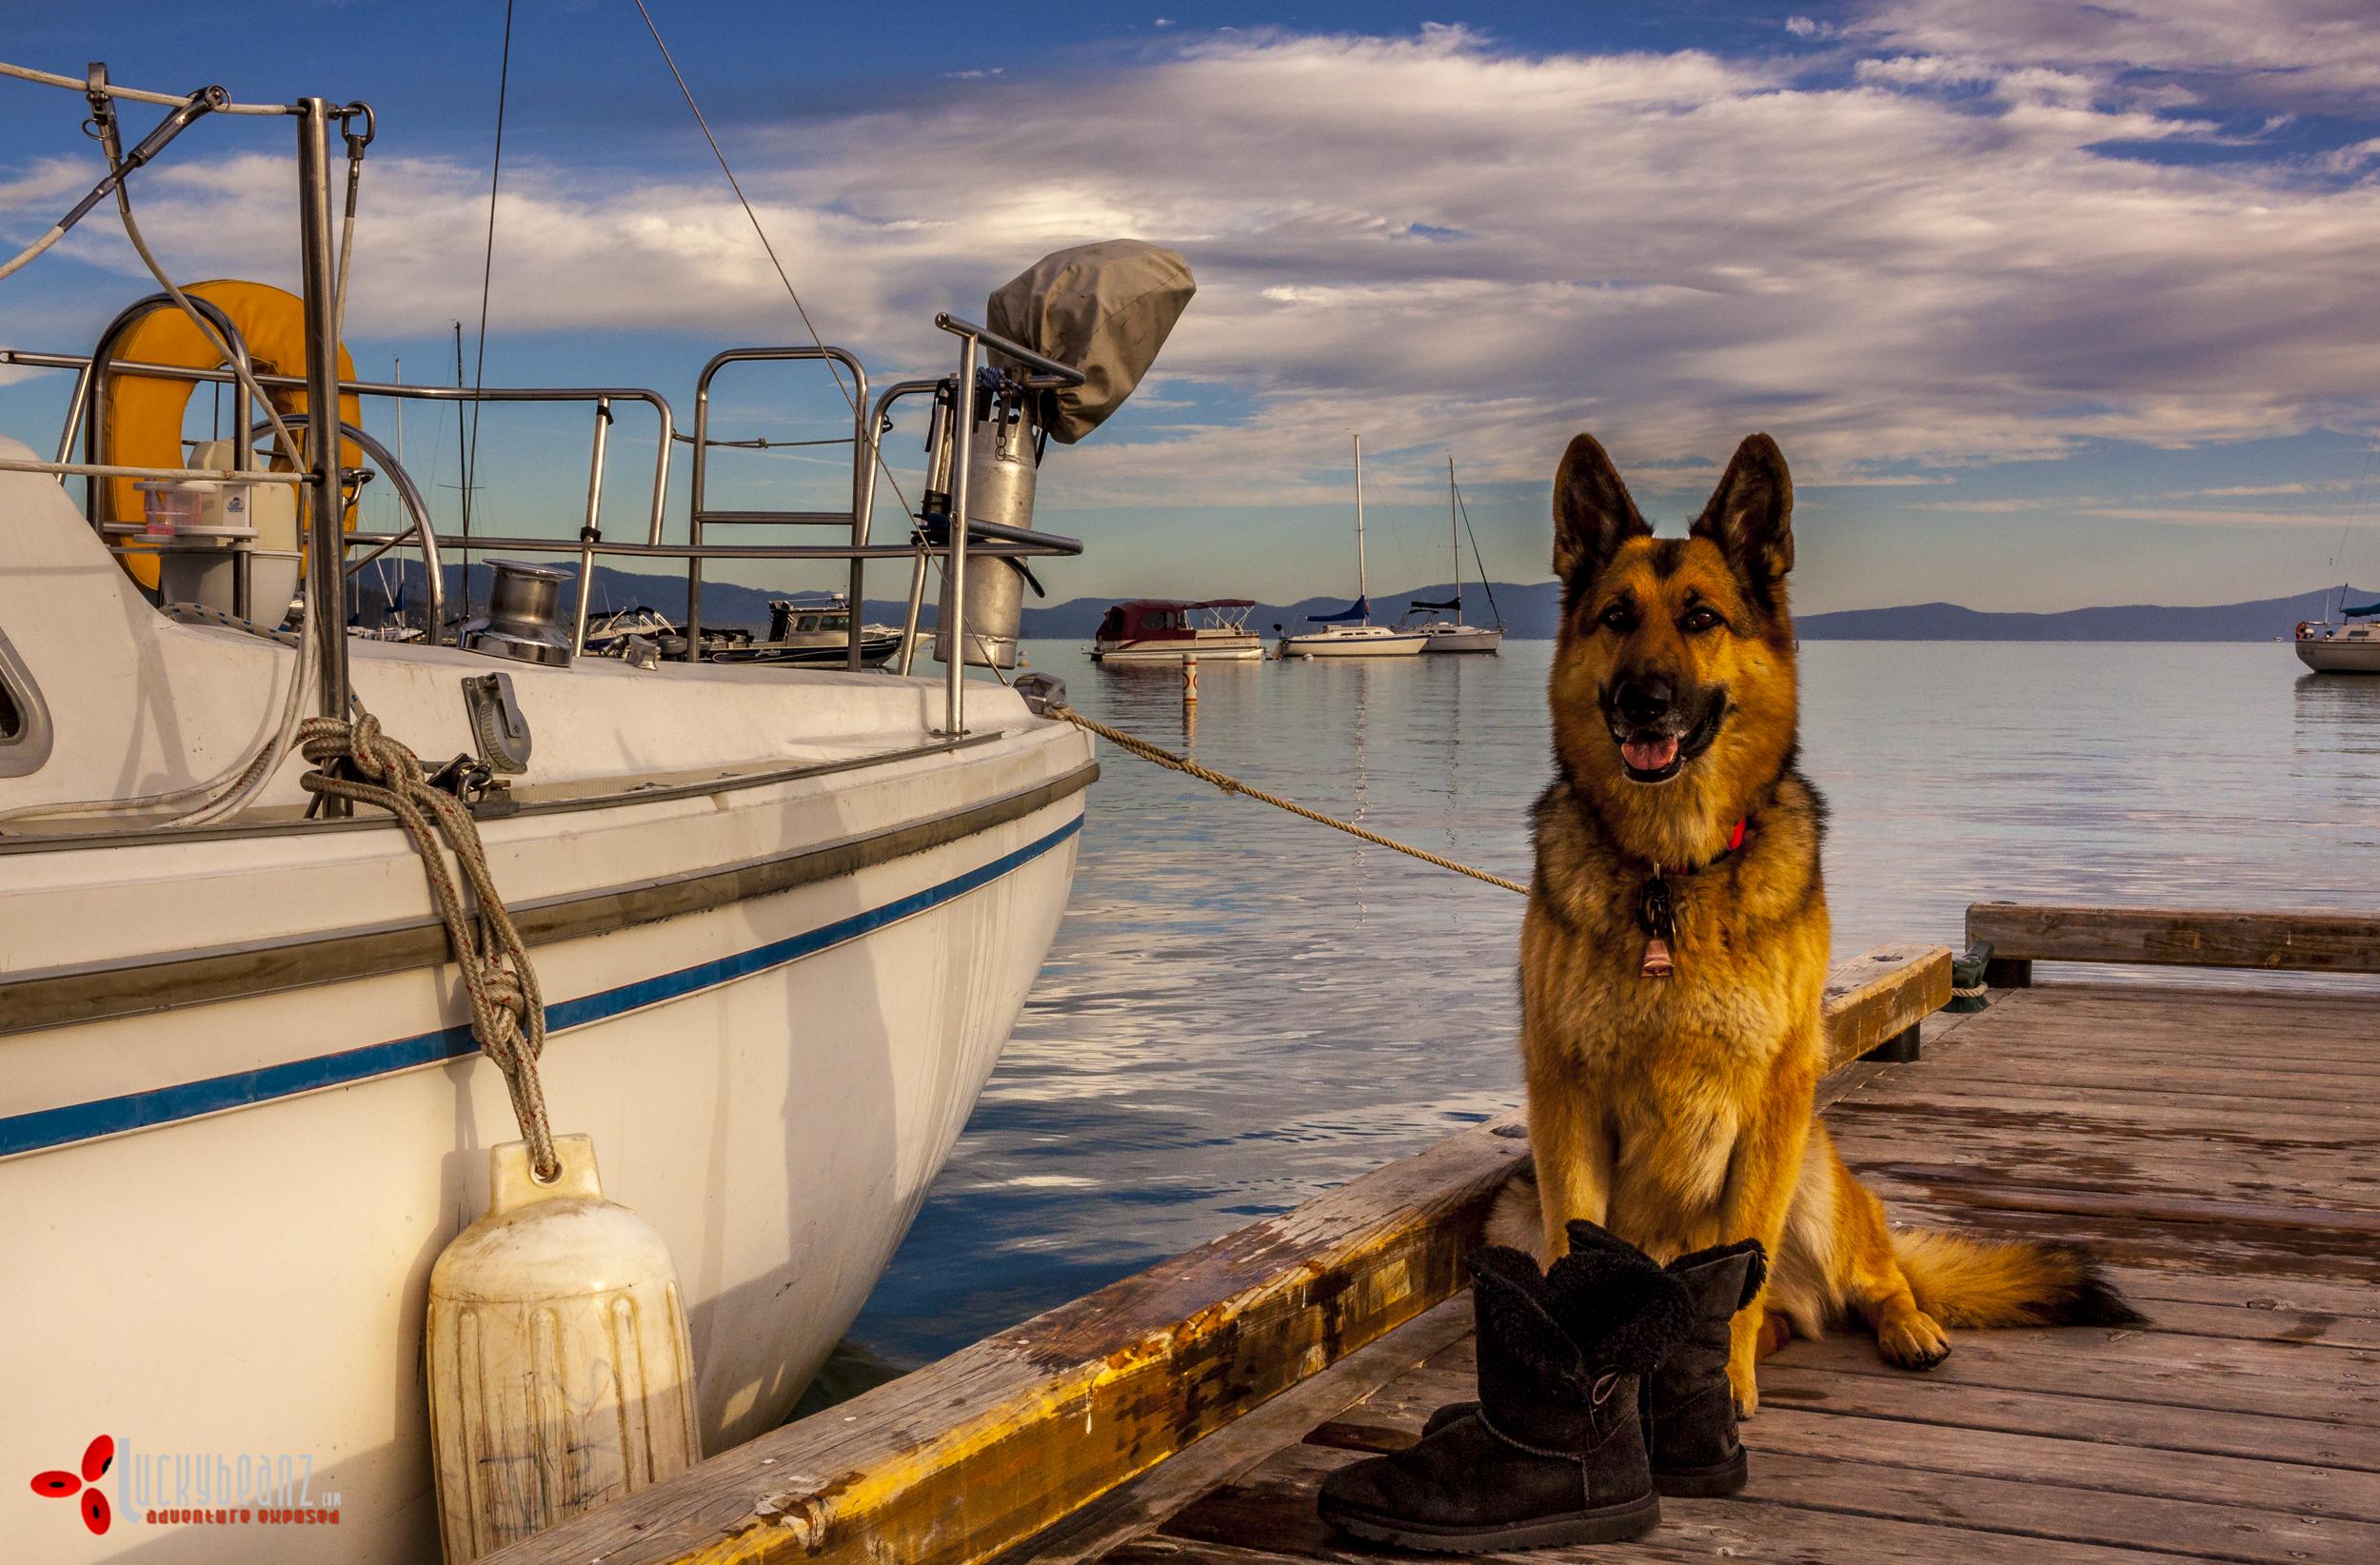 Domino guarding the sail boat.